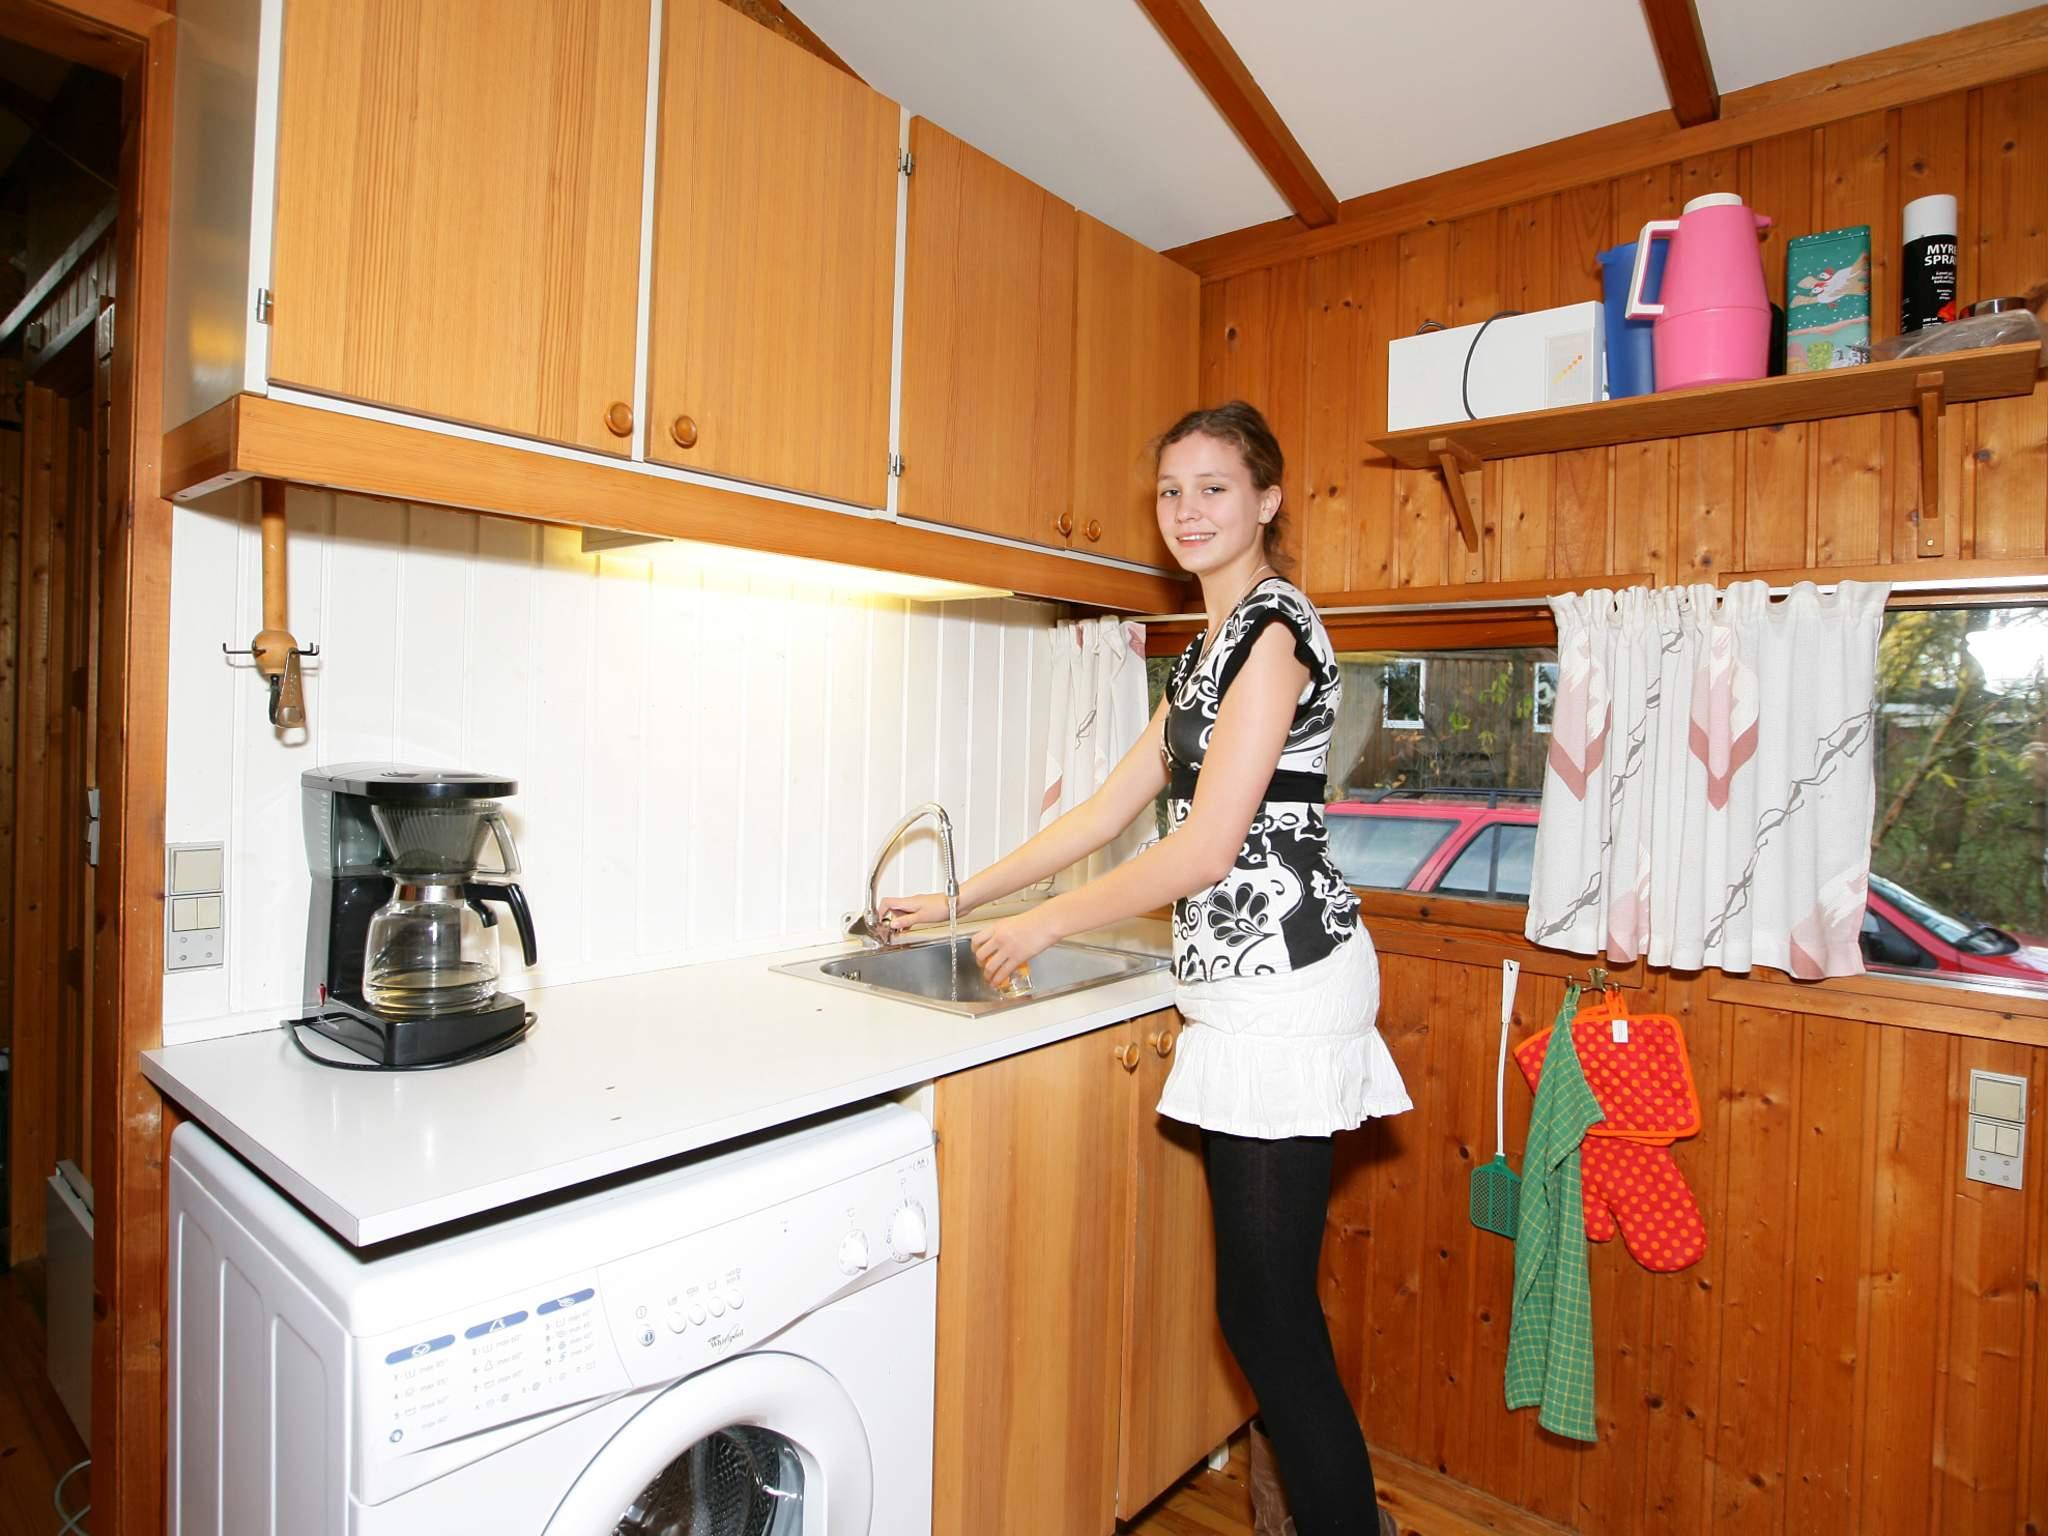 Maison de vacances Hyllingeriis (86362), Skibby, , Seeland Nord, Danemark, image 5